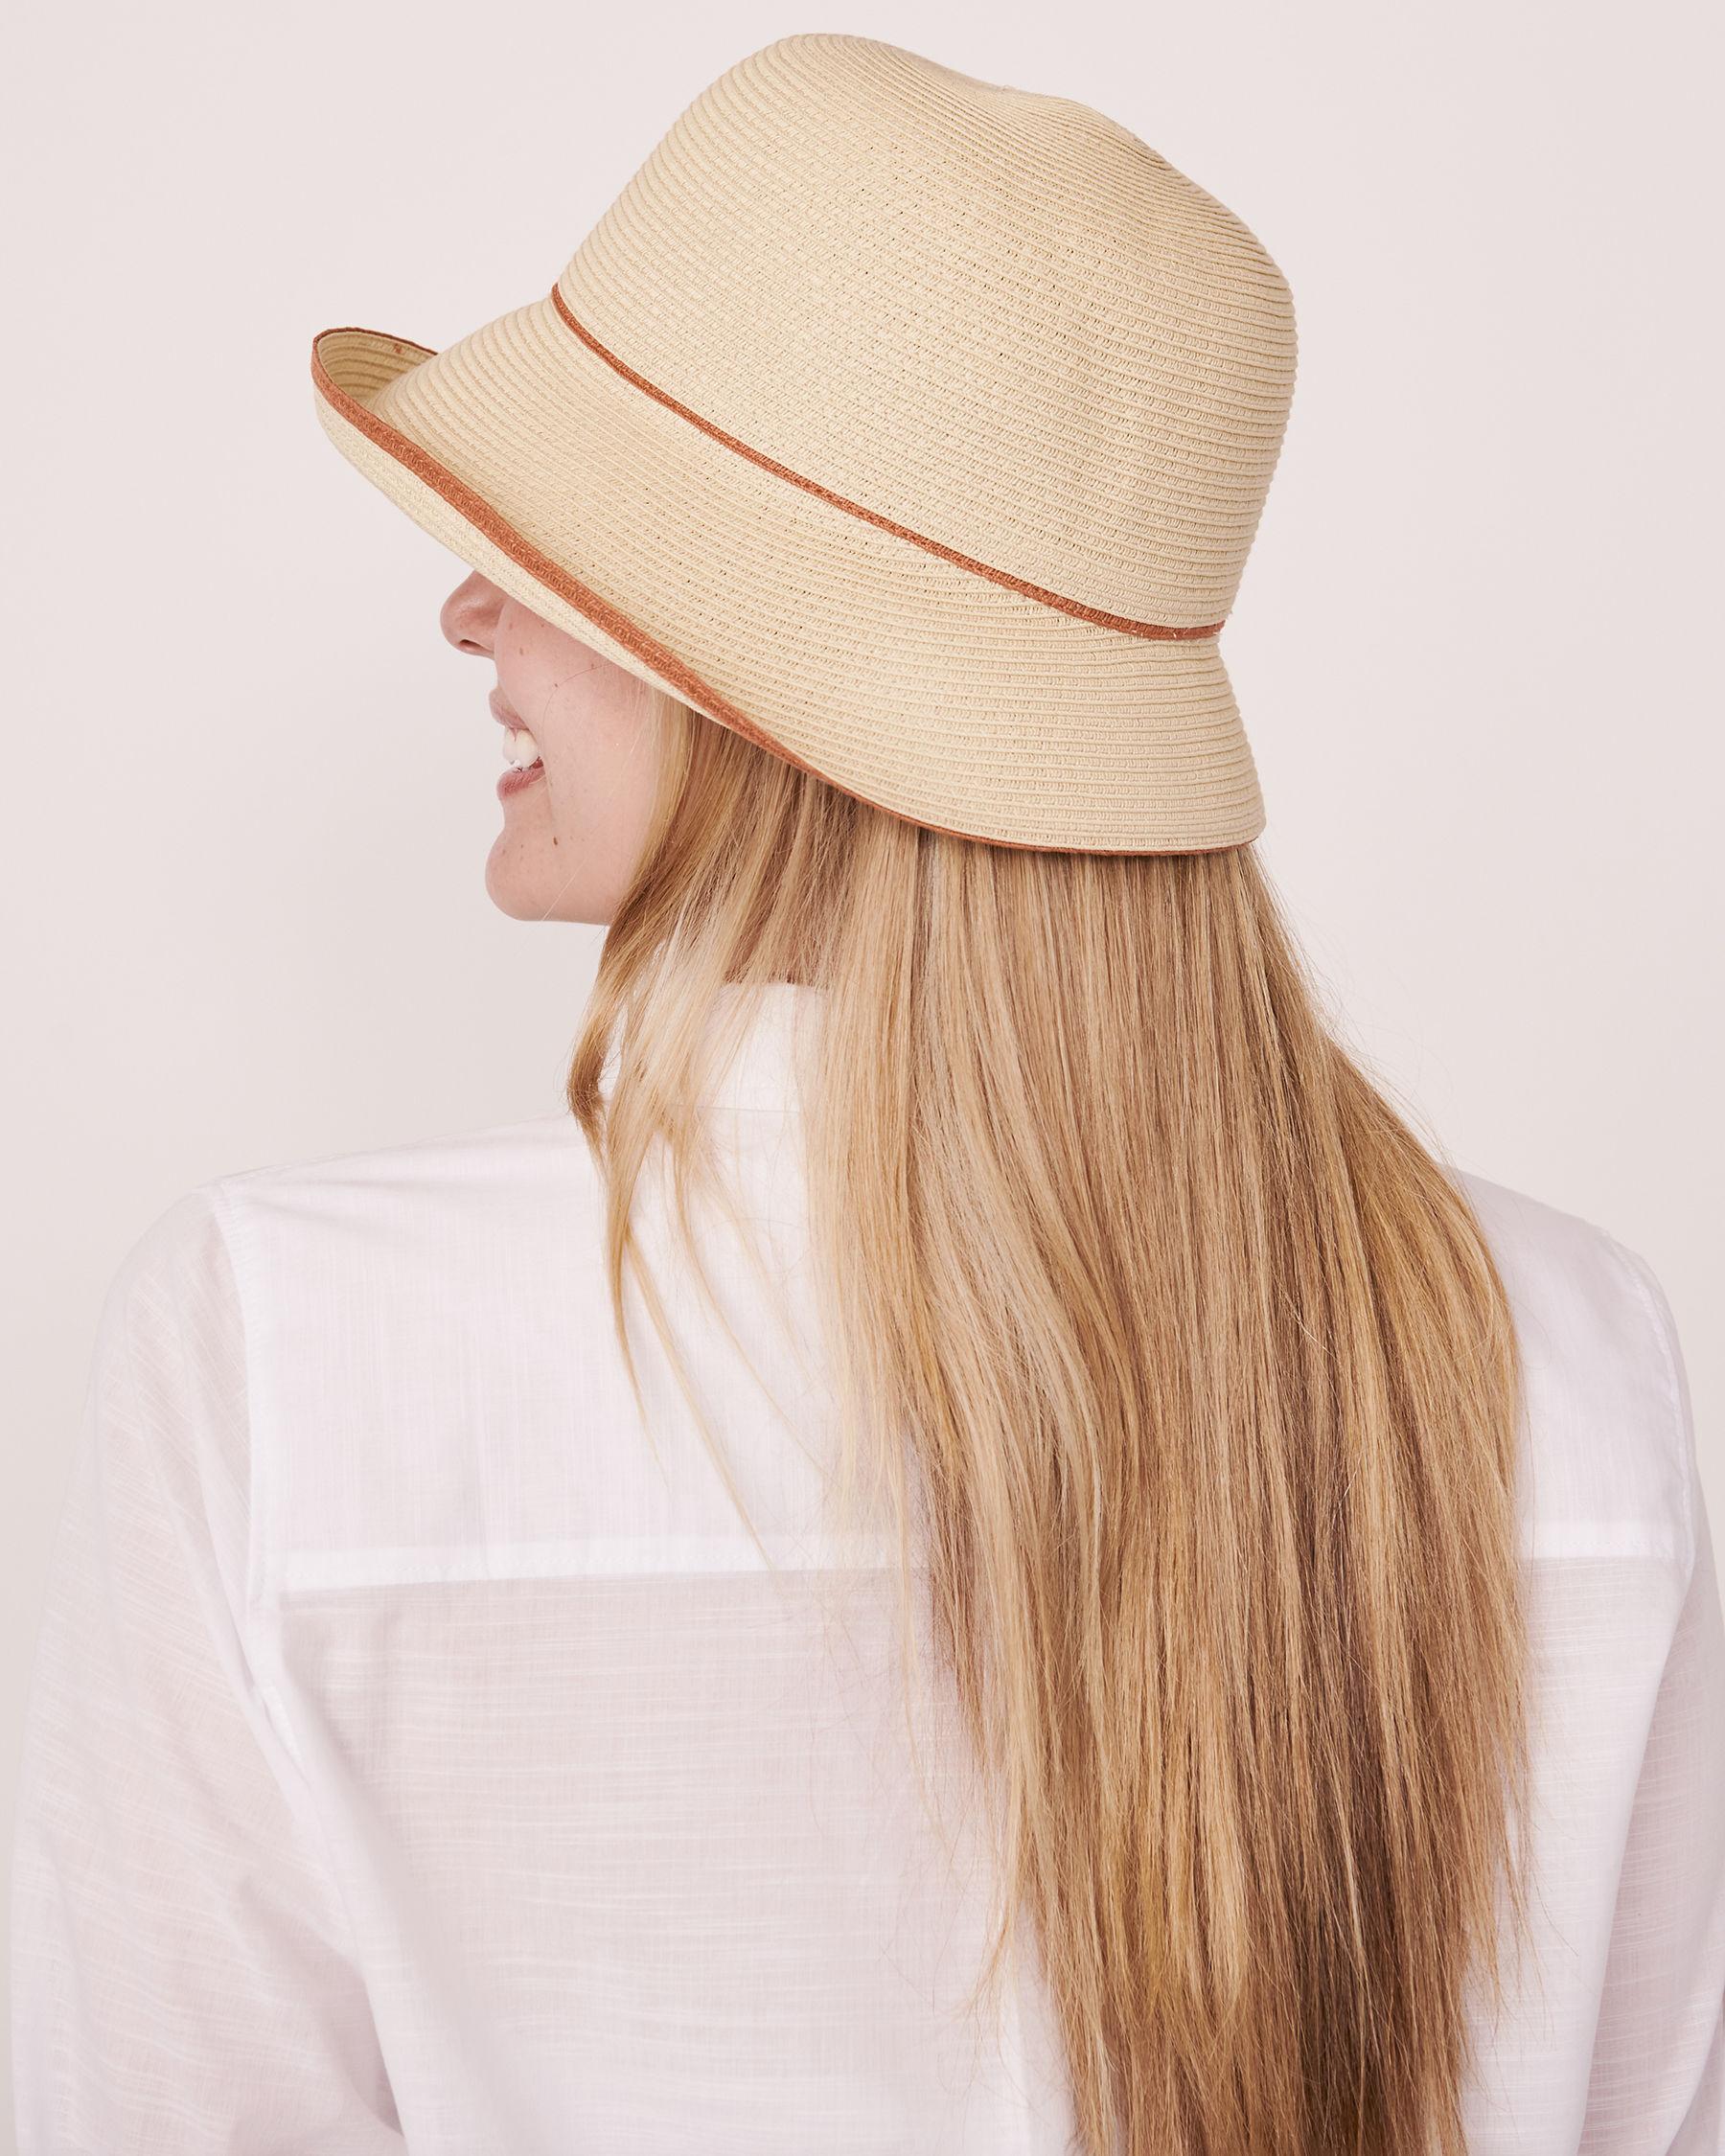 LA VIE EN ROSE AQUA Contrasting Cloche Hat Sand 80500033 - View2